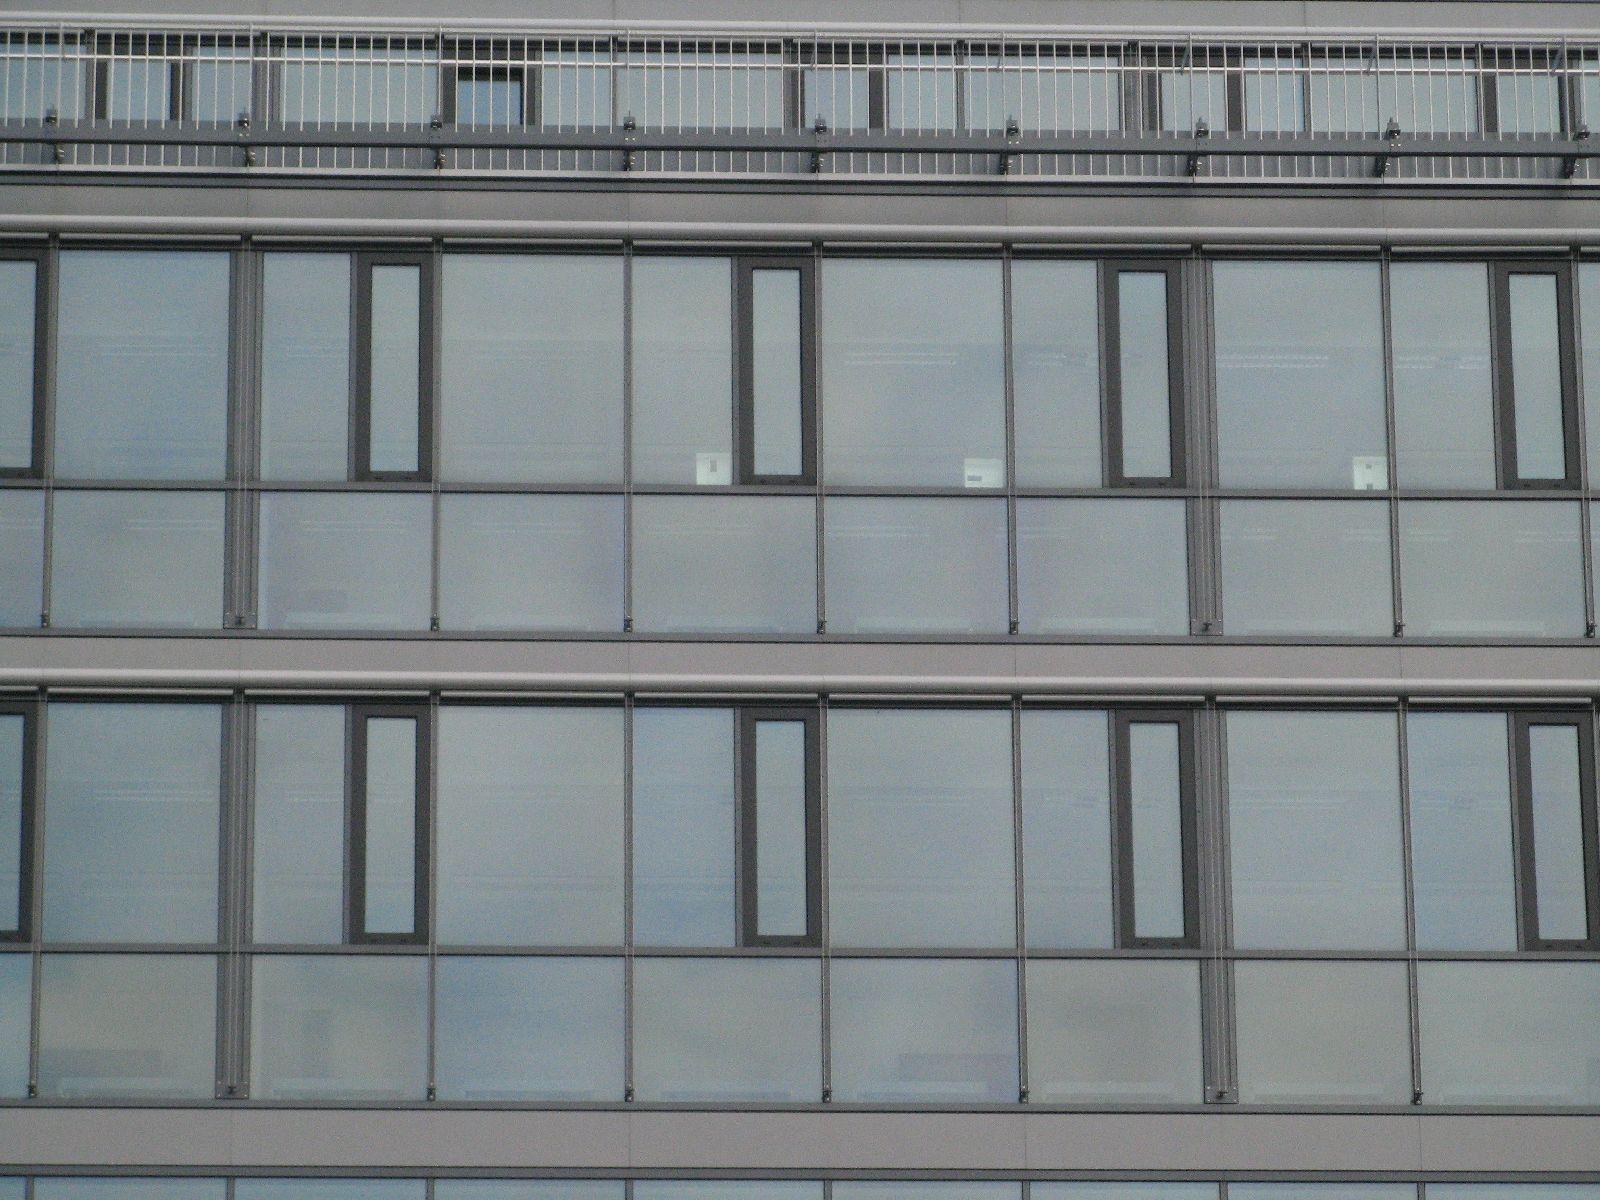 Building_Texture_B_3610